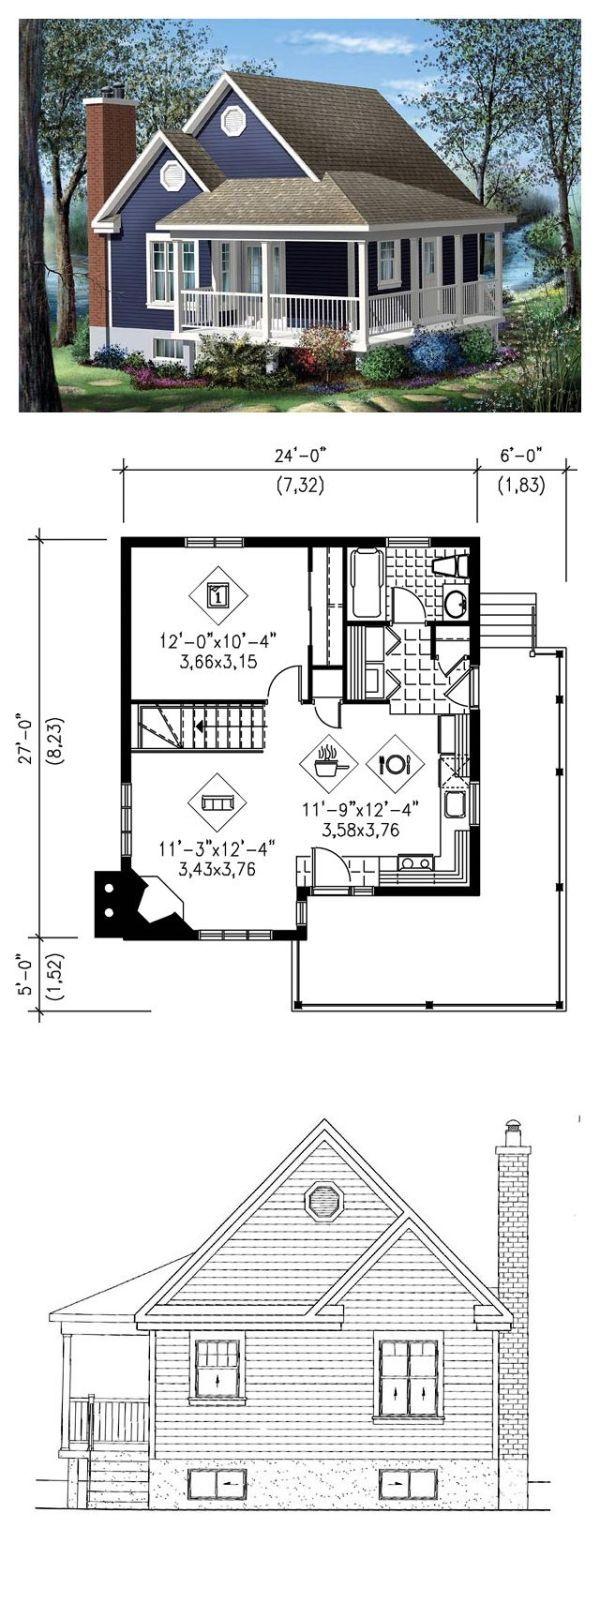 Pin by Krista Callahan on casa planejada in 2021 Micro